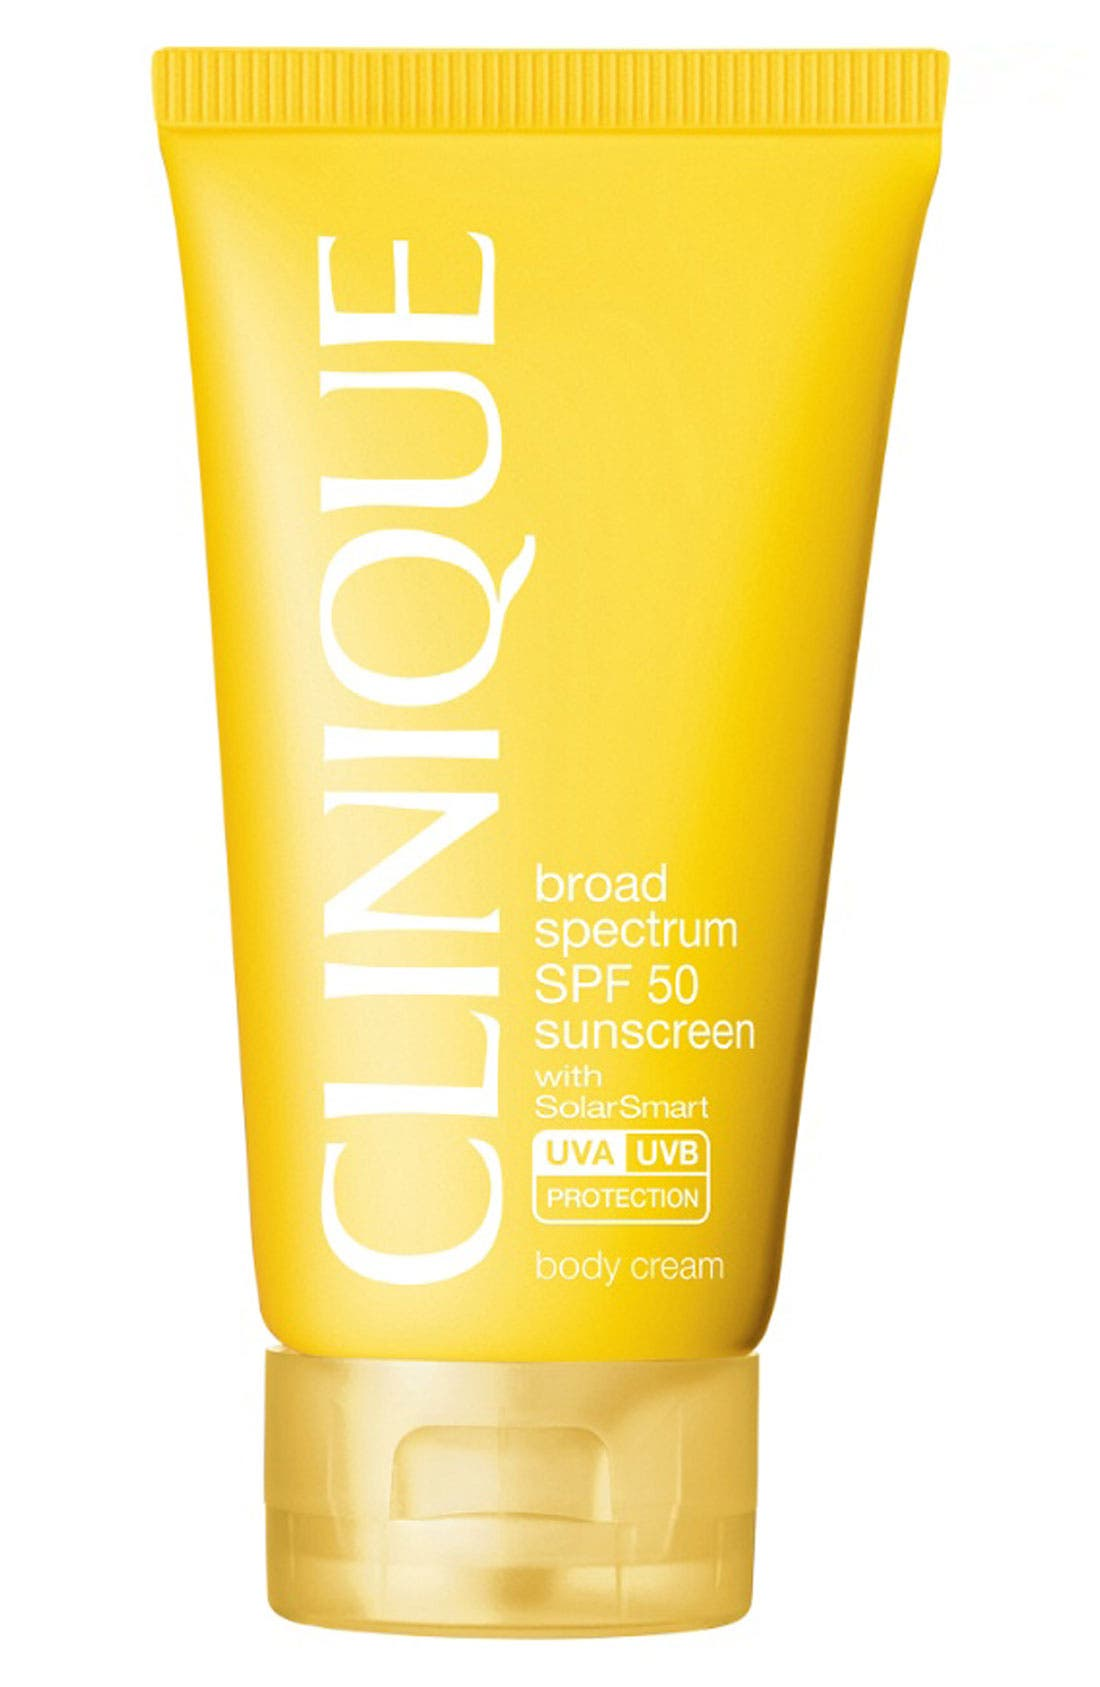 Sun Broad Spectrum SPF 50 Body Cream,                             Main thumbnail 1, color,                             NO COLOR